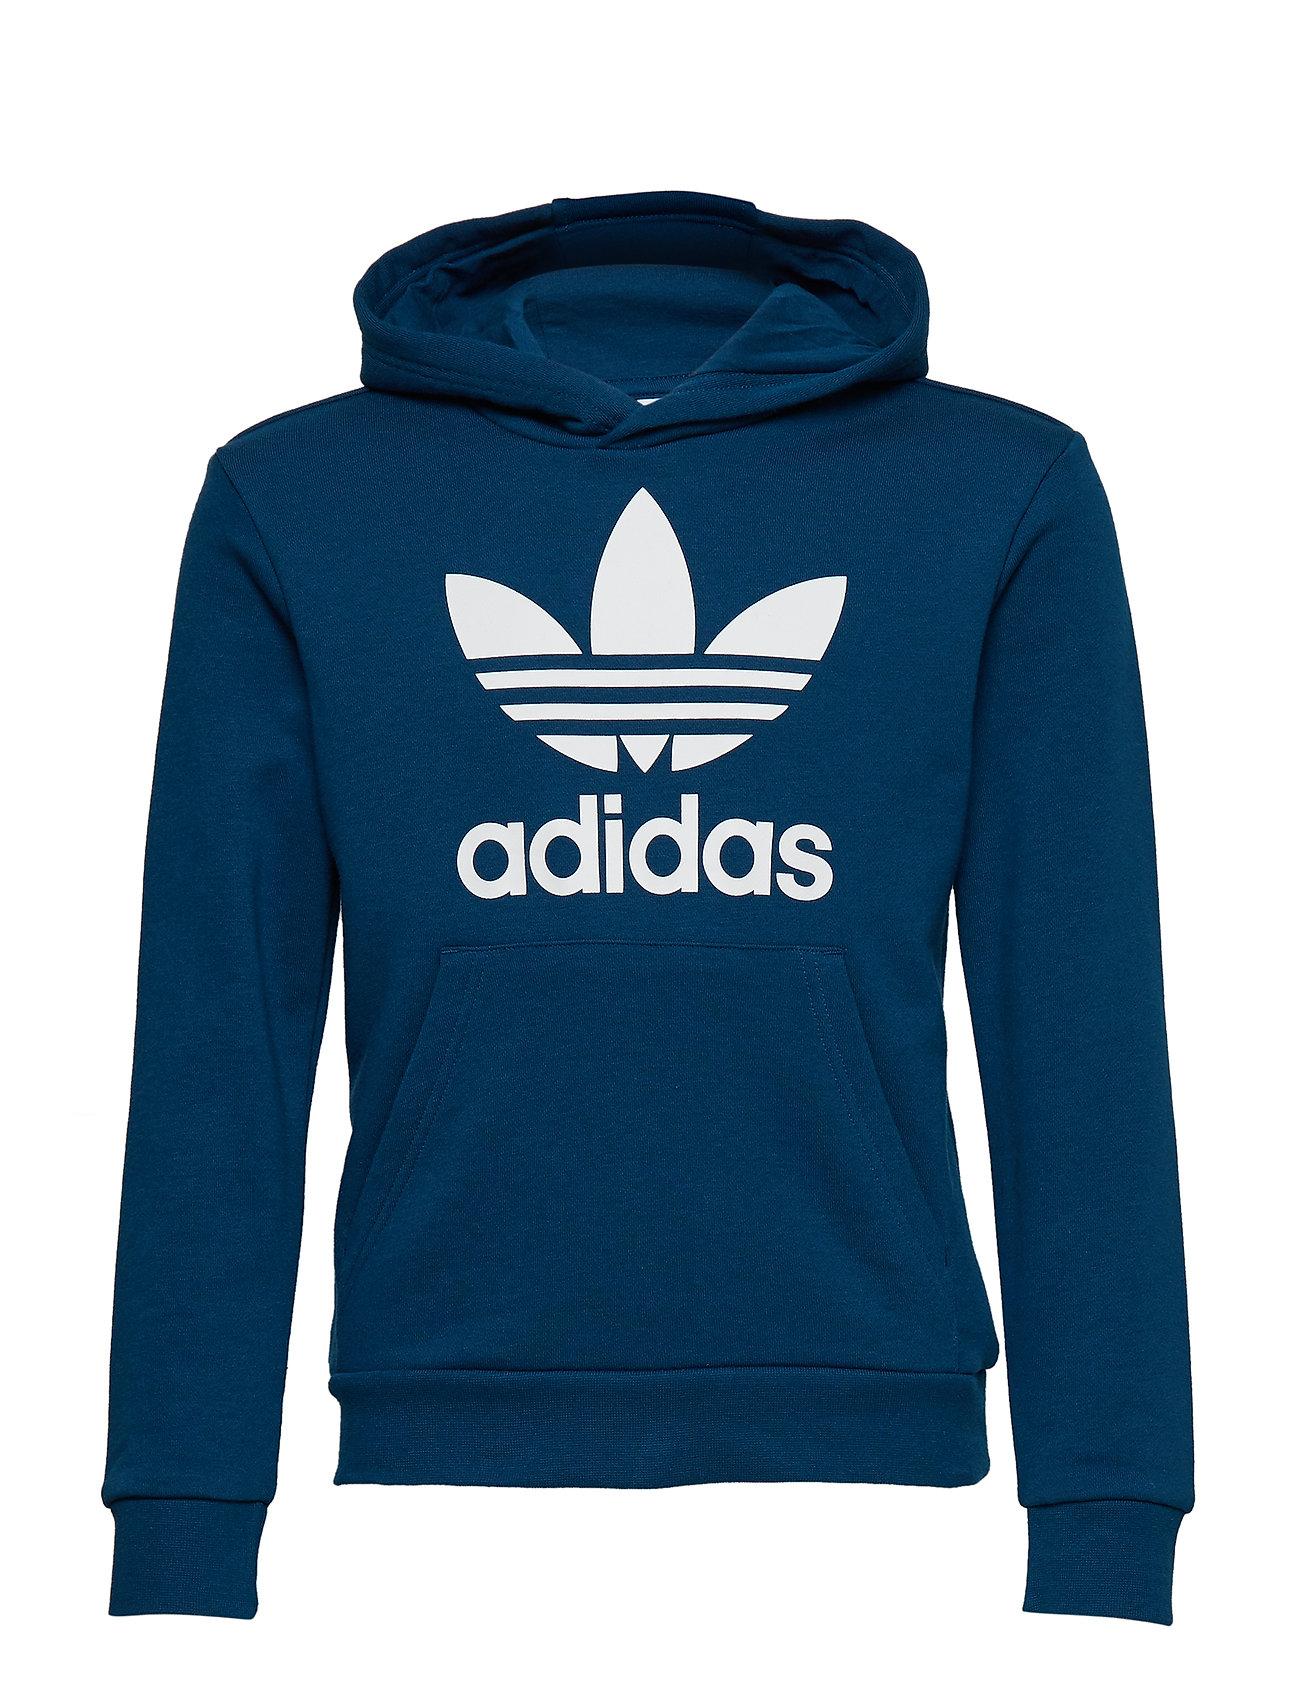 0a22a4b1 Adidas hoodies – Trefoil Hoodie til børn i Sort - Pashion.dk